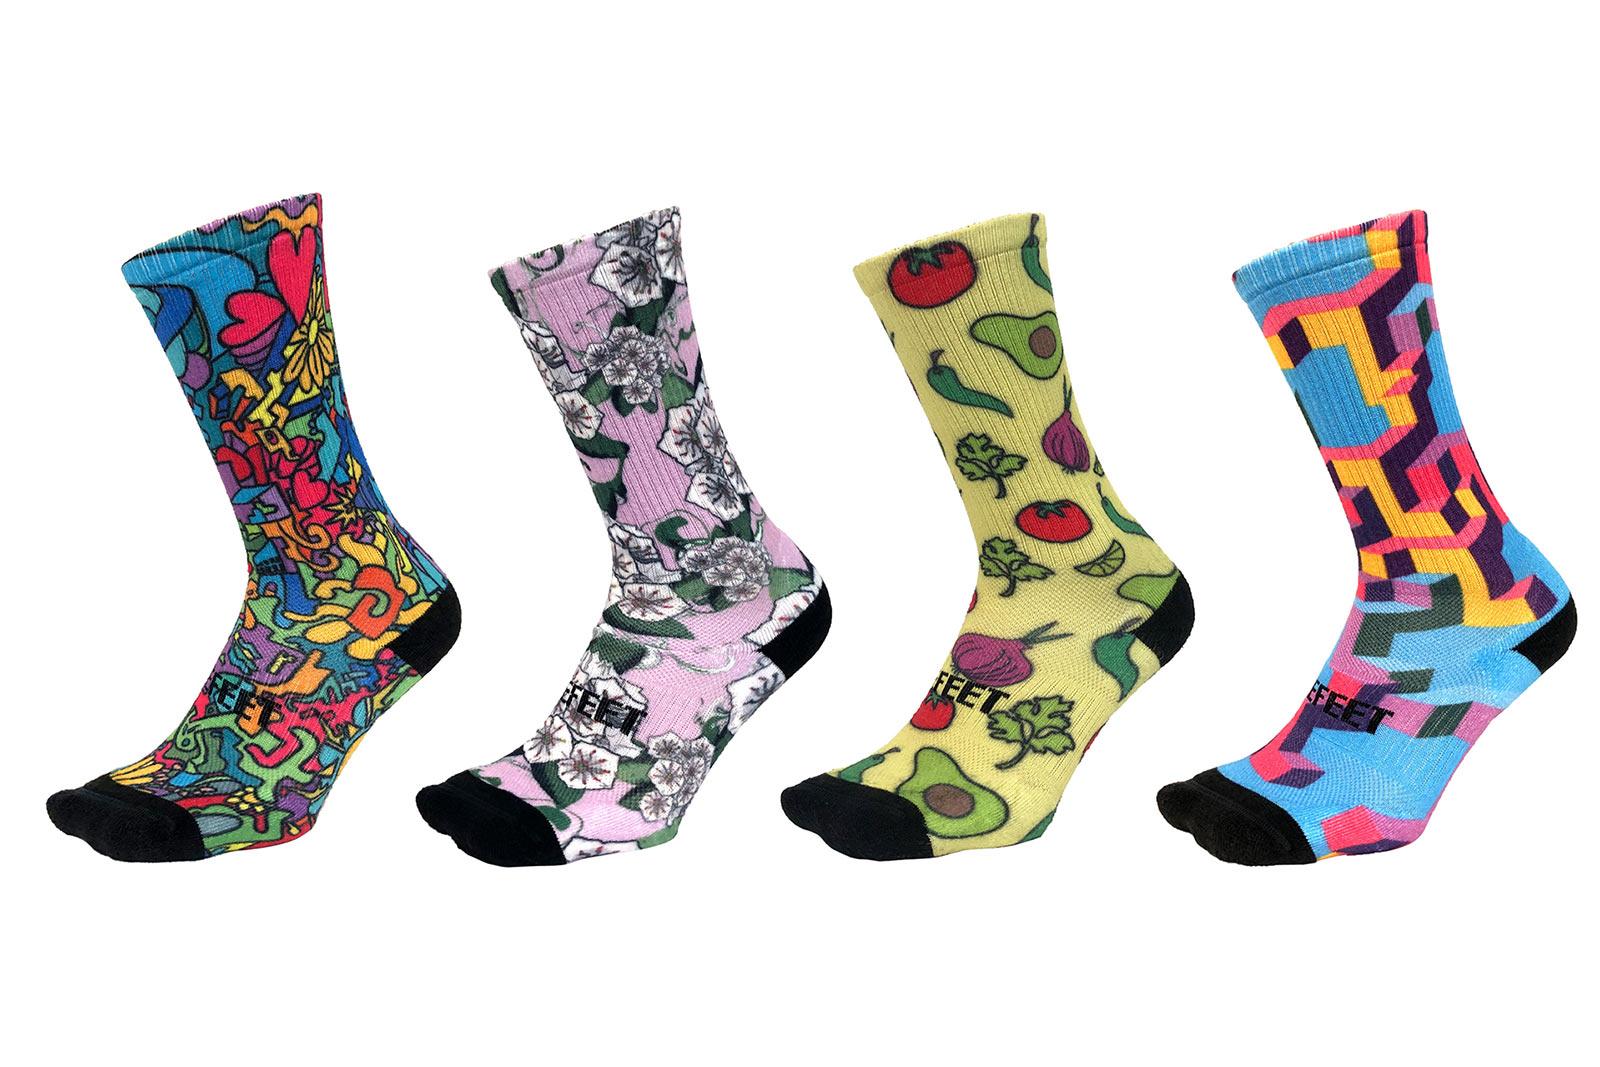 custom sock design examples from DeFeet PrintMySock custom sock designer